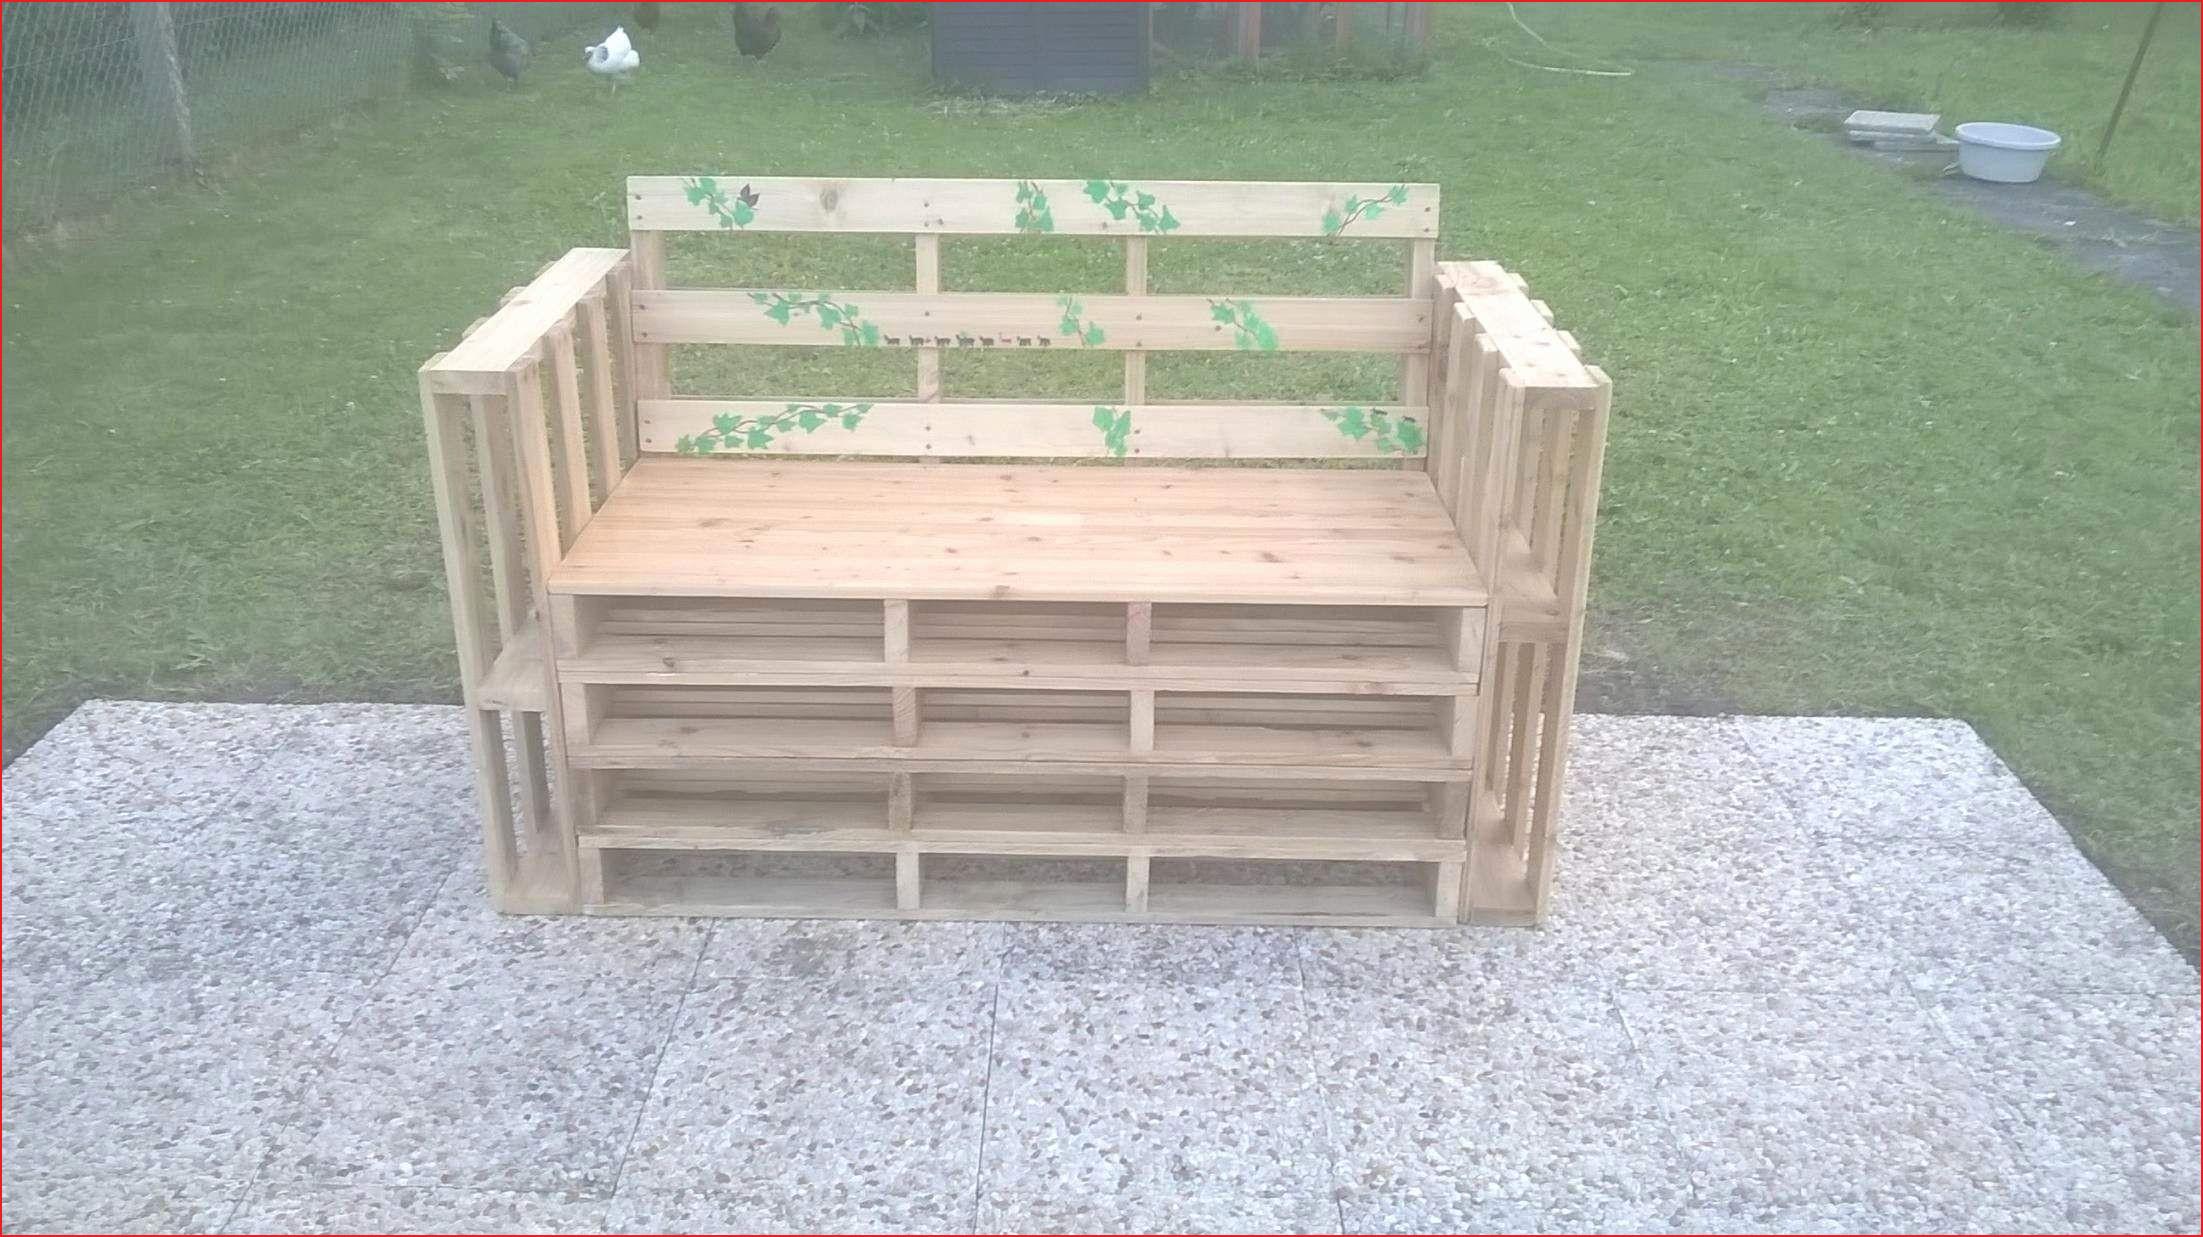 24 Frais Table De Jardin Avec Banc | Salon Jardin serapportantà Coffre Jardin Brico Depot